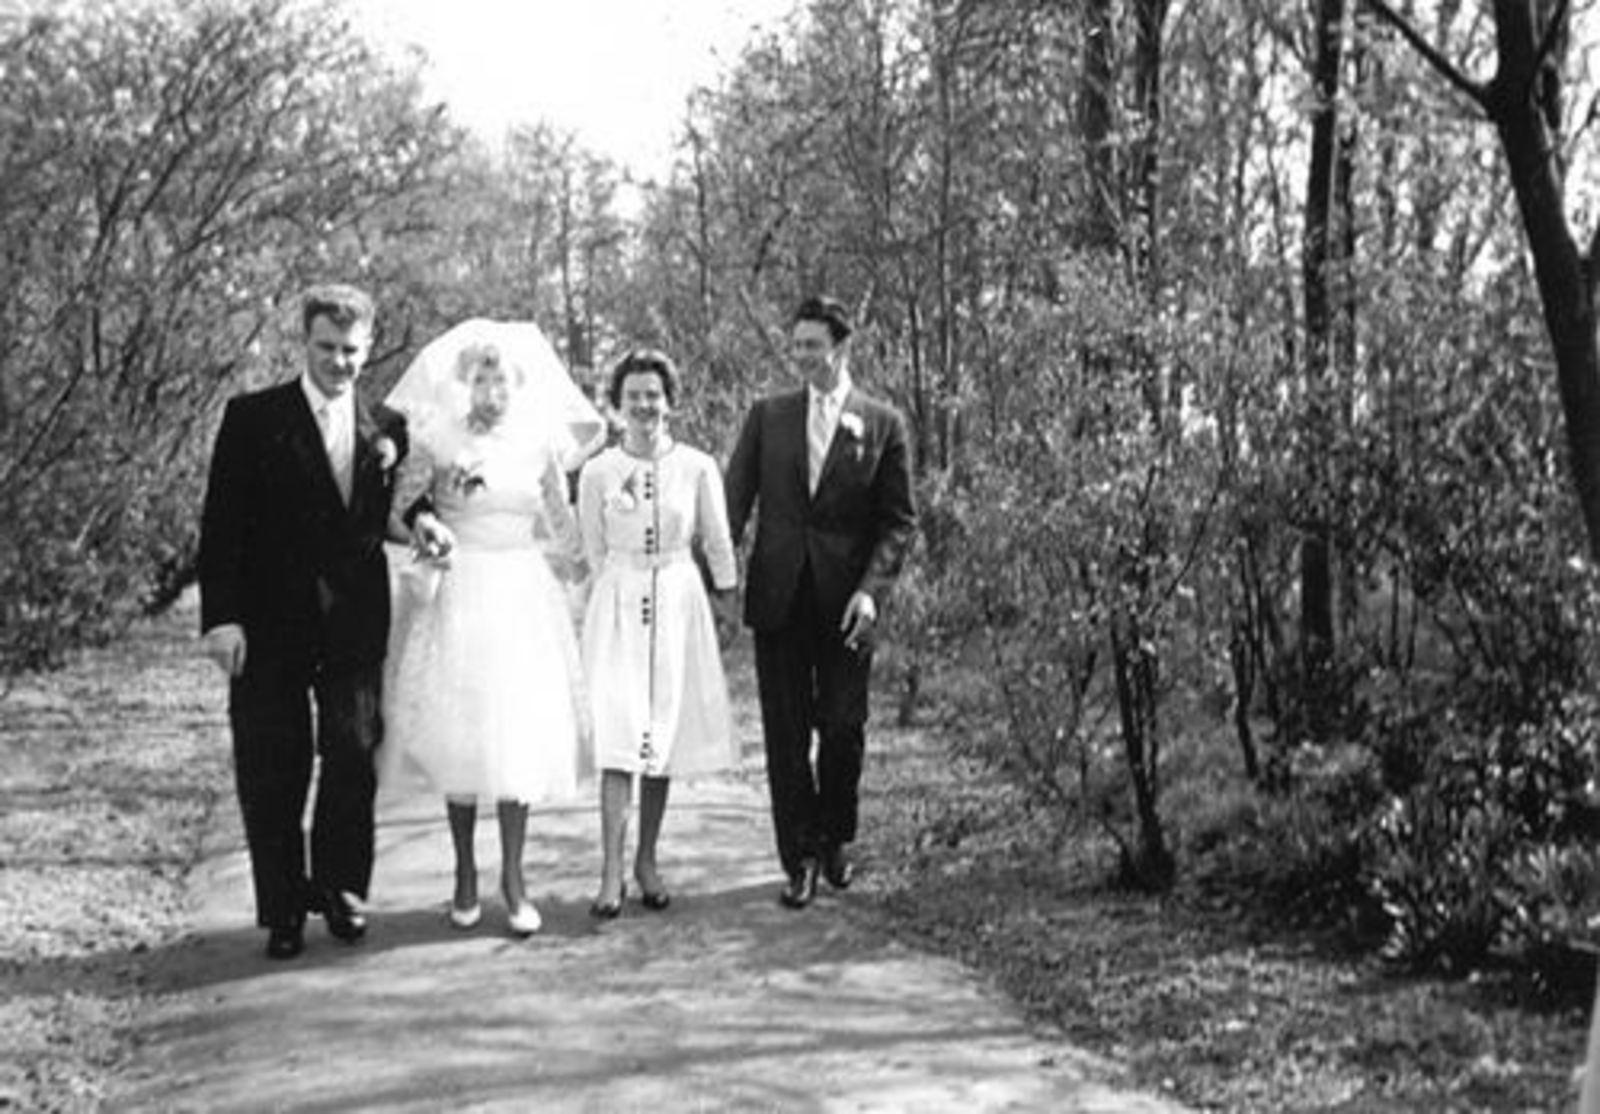 Boslaan 0000 Wandelbos 19__ Ria Koeckhoven trouwt Harry Leemkuil 02